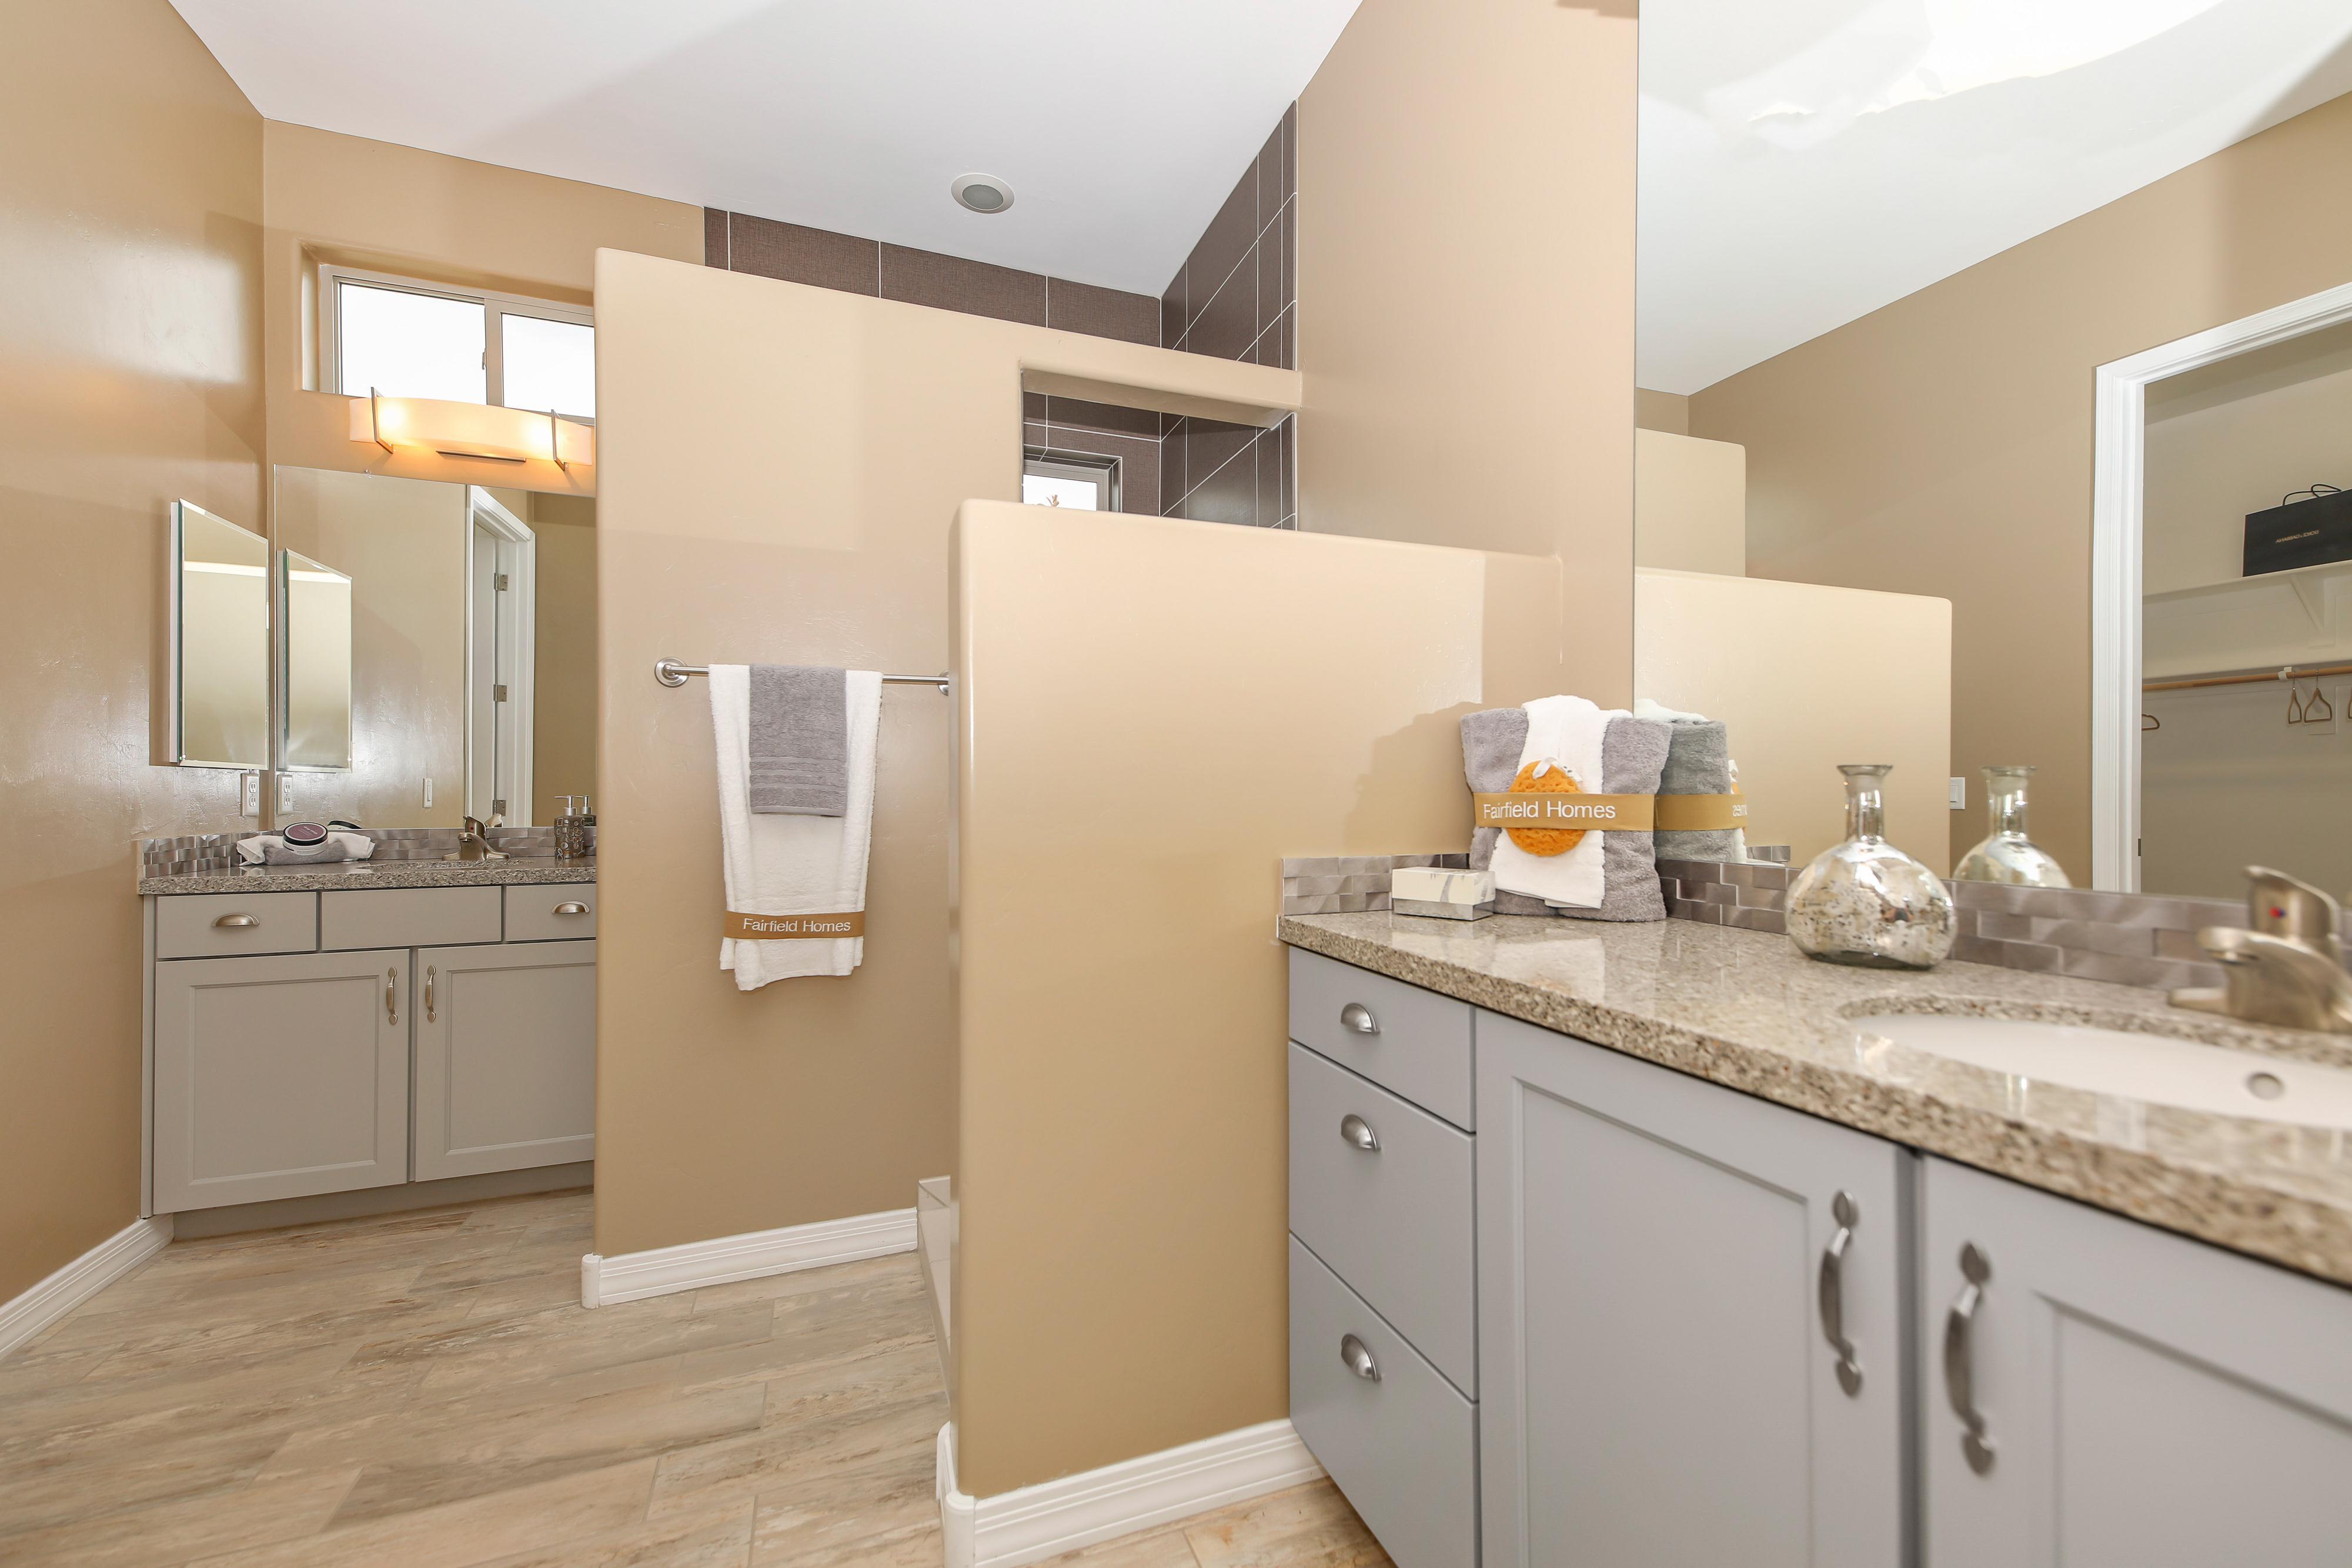 Bathroom featured in the Cimarron By Fairfield Homes in Tucson, AZ